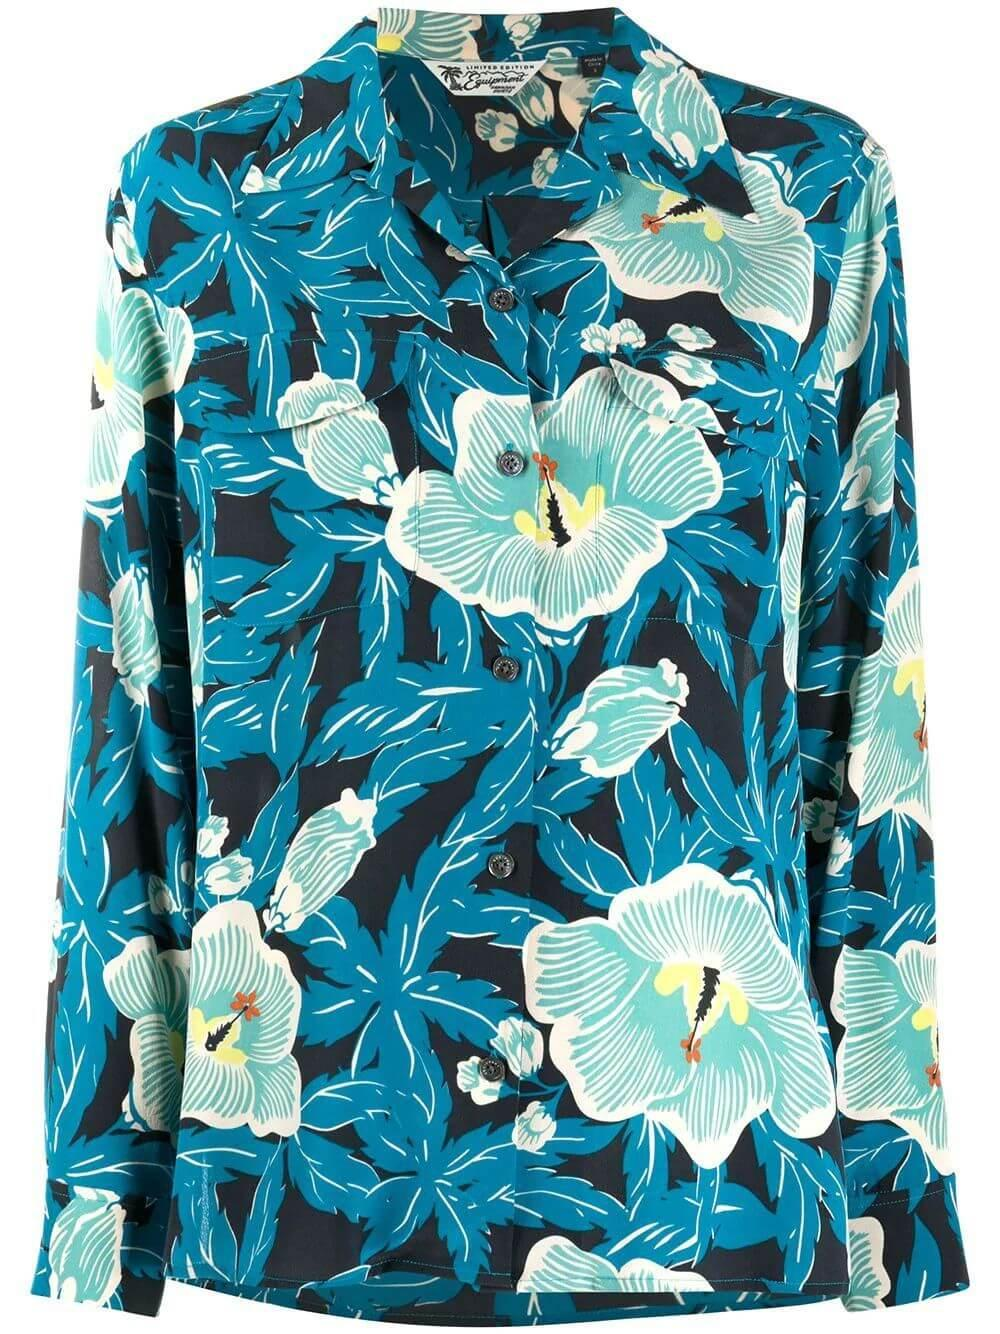 Amaia Saxony Blue Print Blouse Item # 7339-TP03920